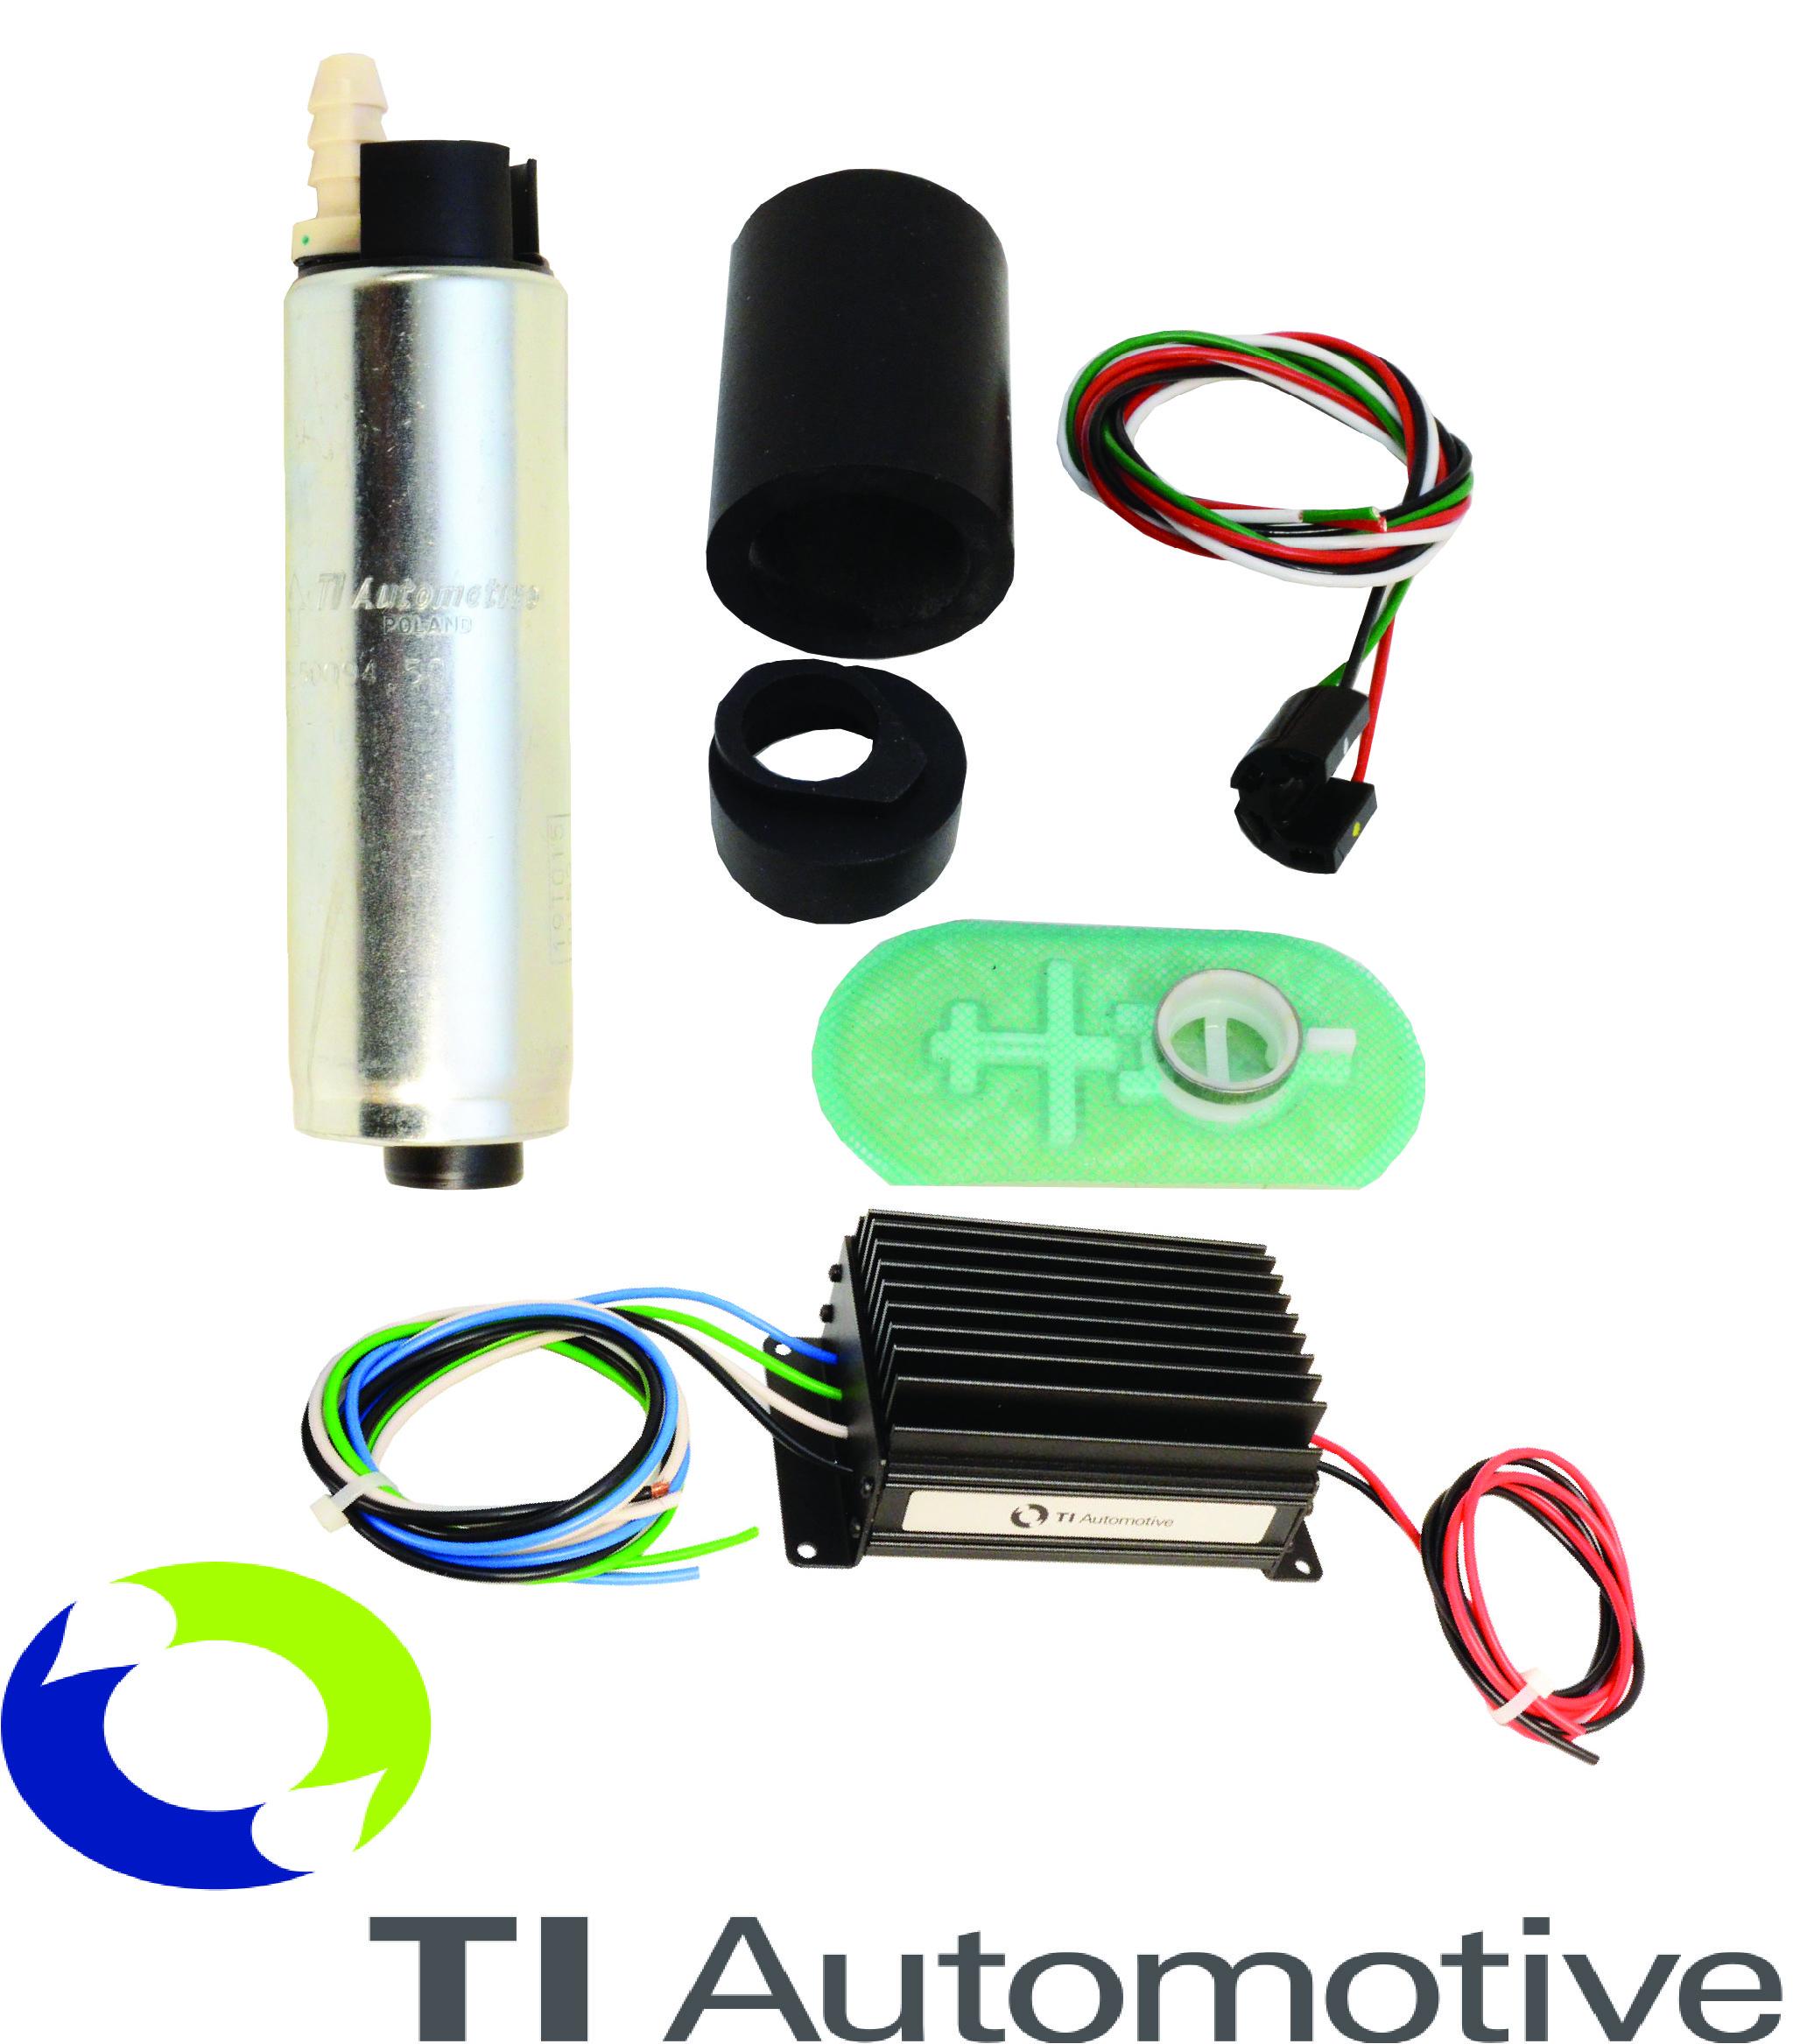 Ti Automotive (Walbro) Brushless Fuel Pumps